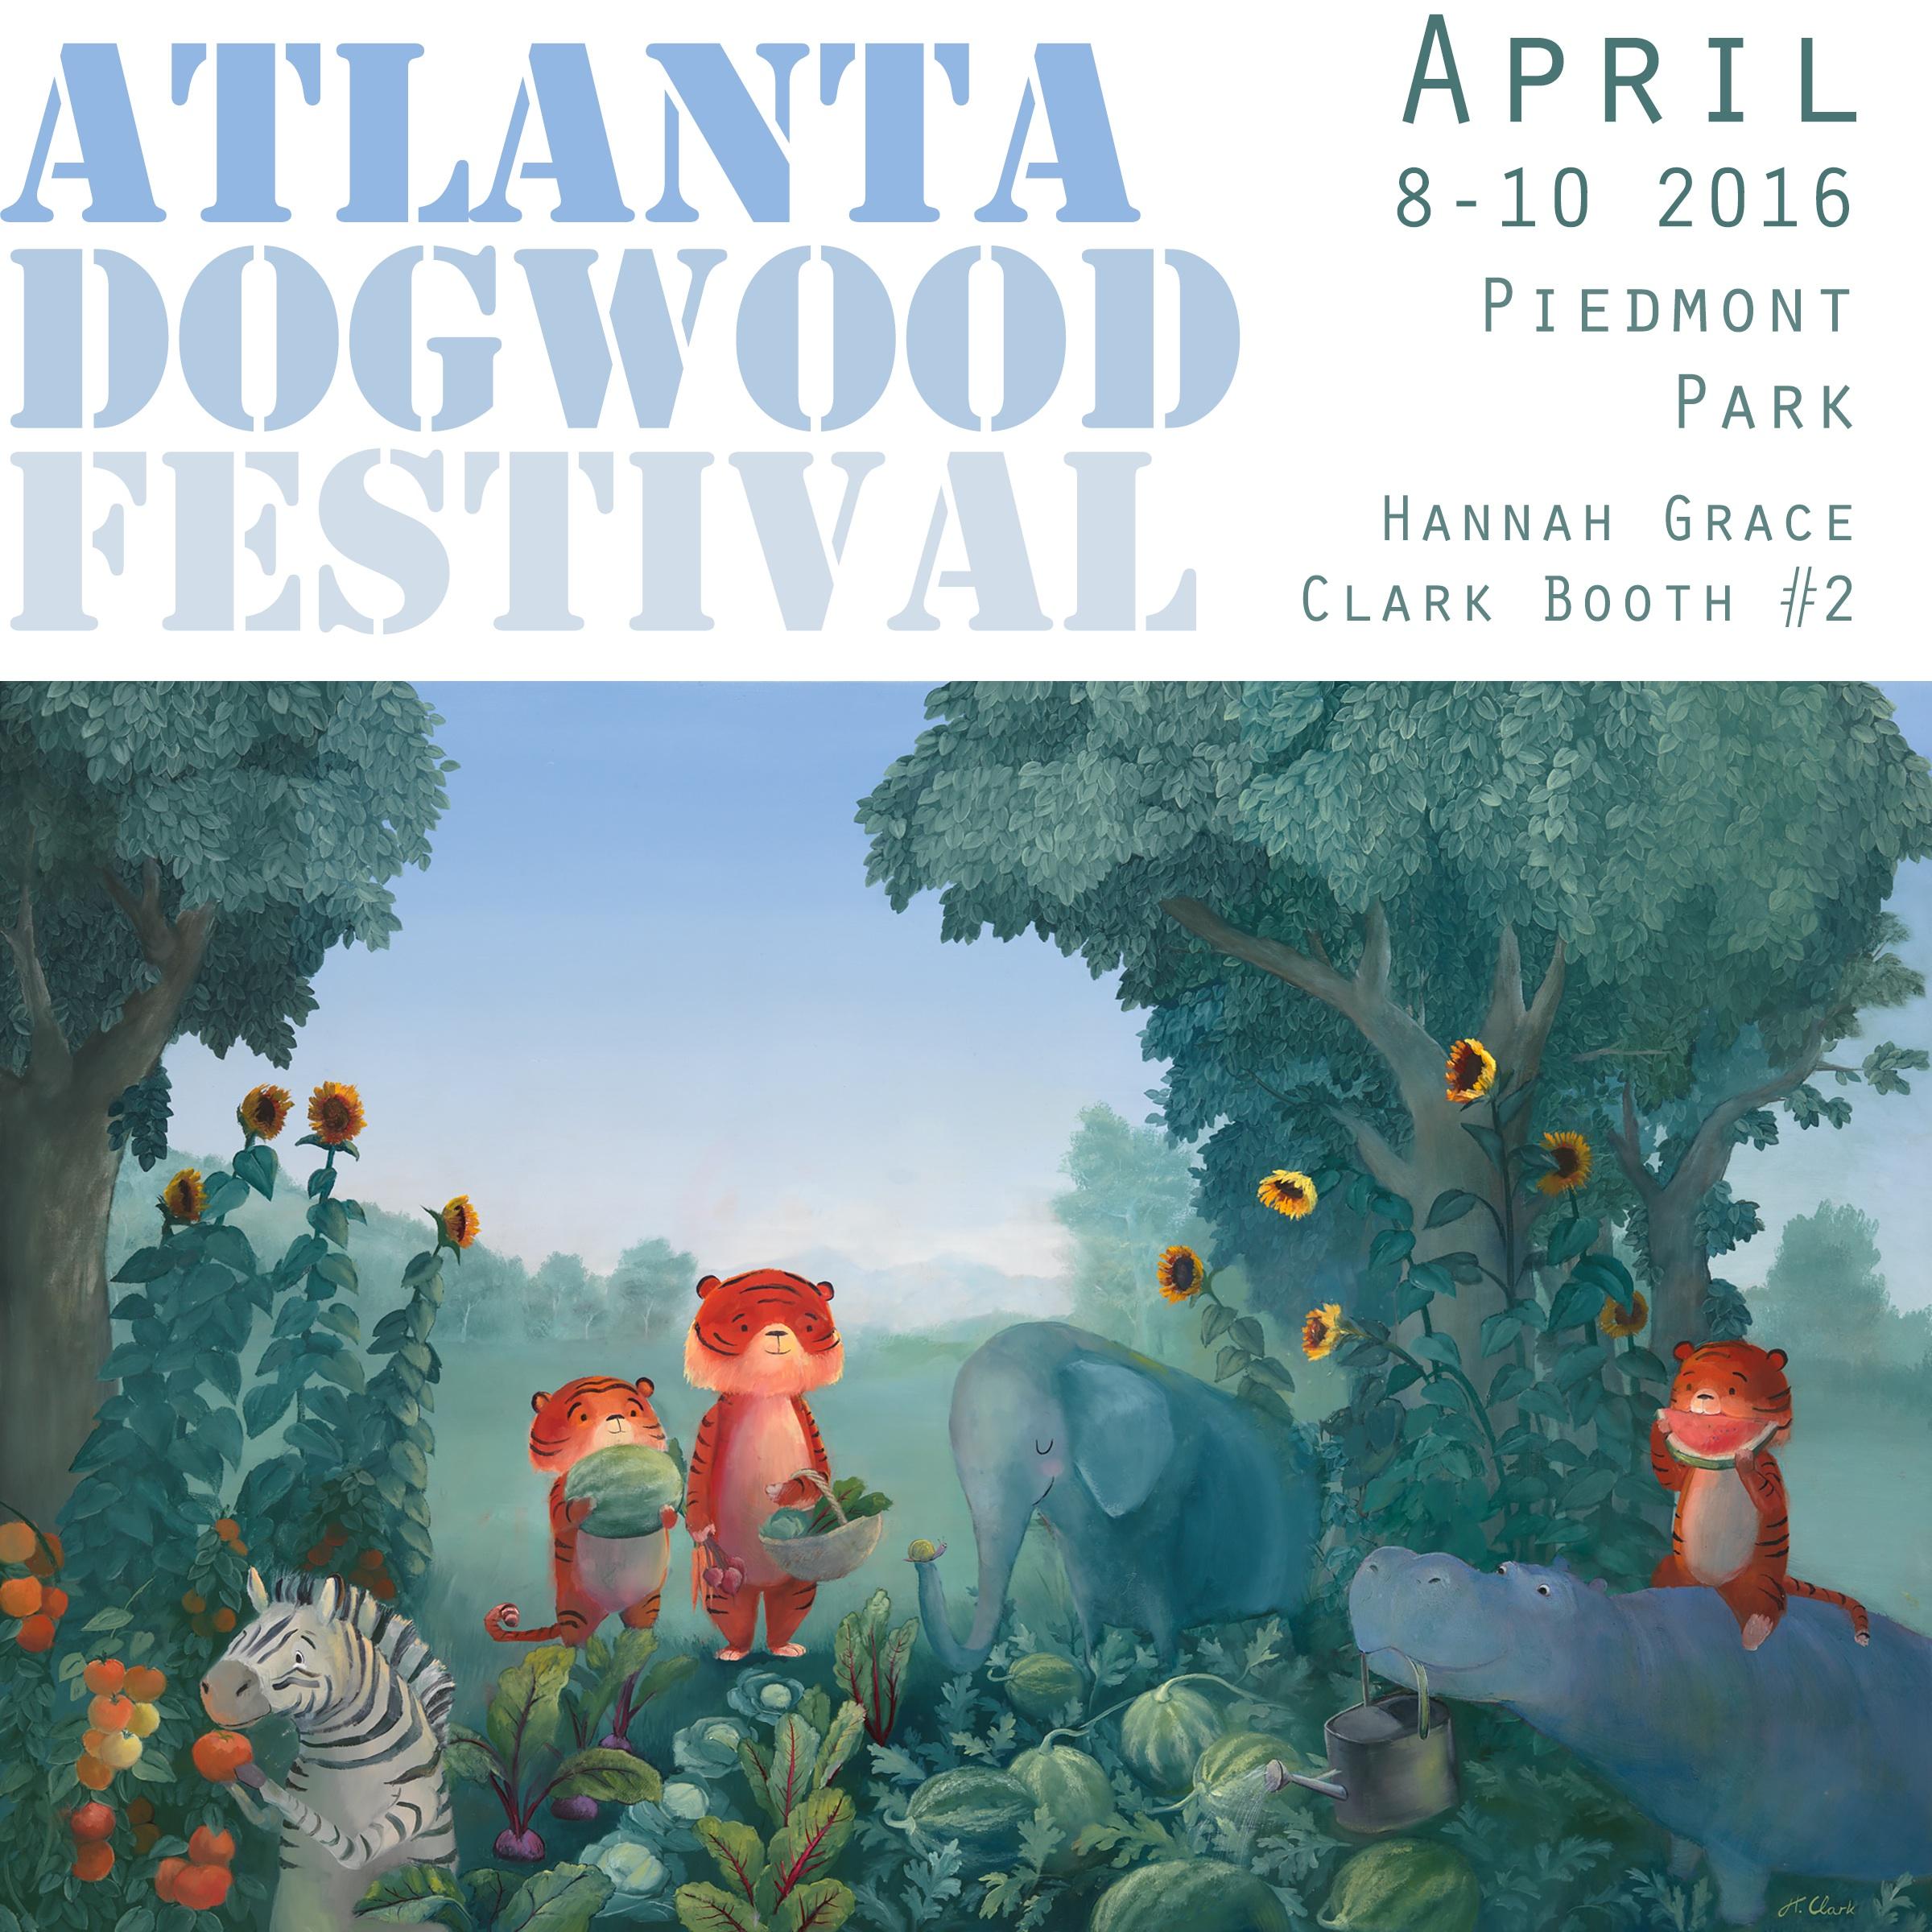 Hannah Grace Clark at Atlanta Dogwood Festival